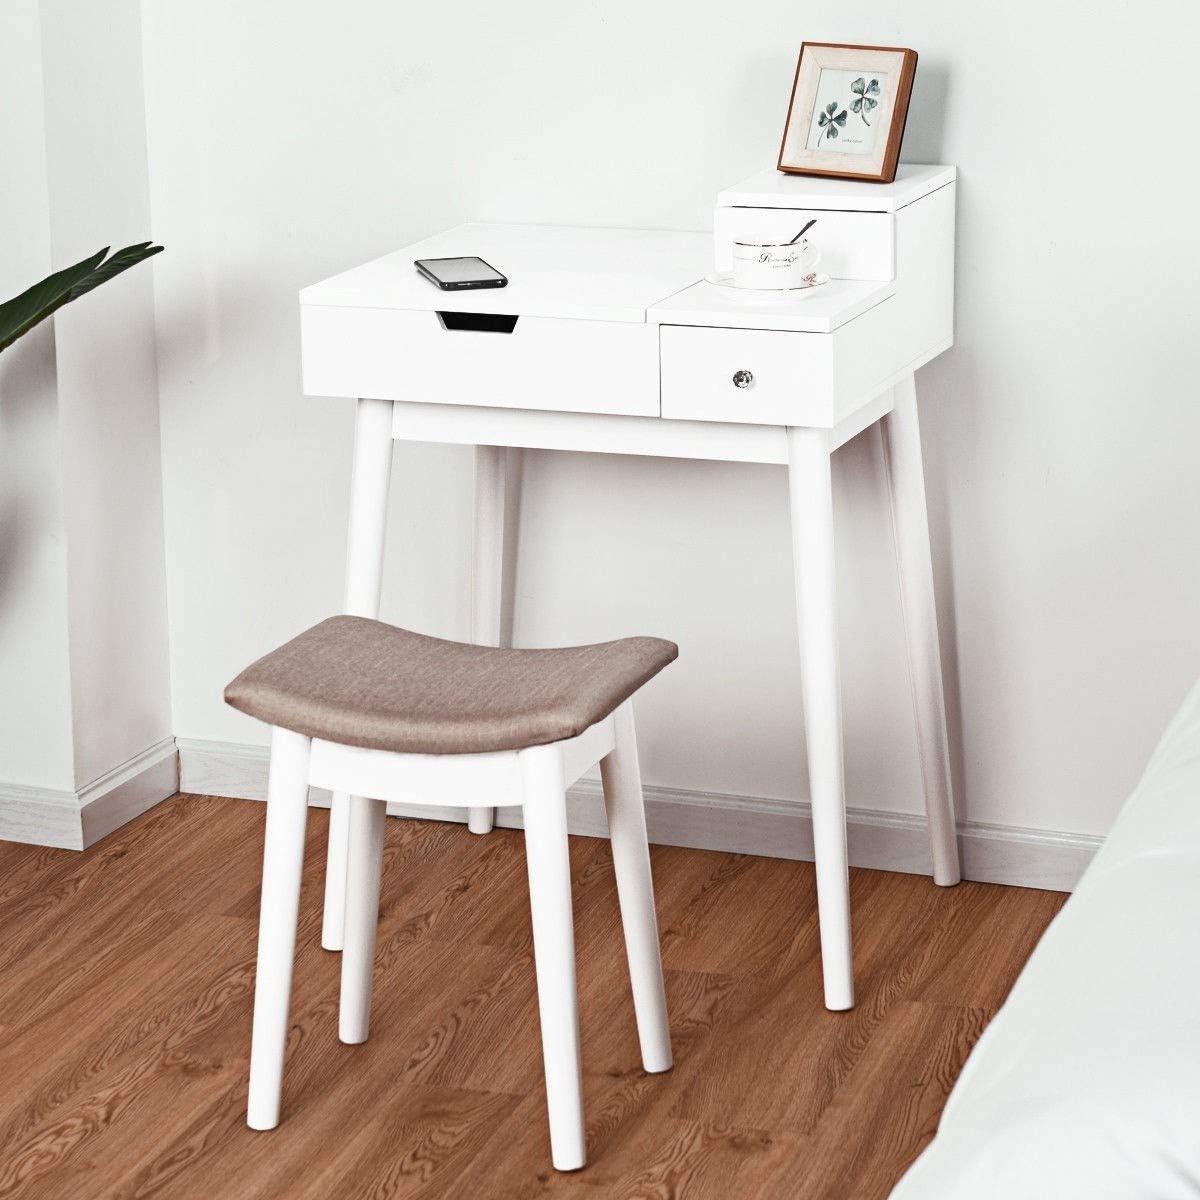 Kanizz Mirror Desk Furniture Max 62% OFF Stool Vanity Elegant Makeup Flip Ha Reservation